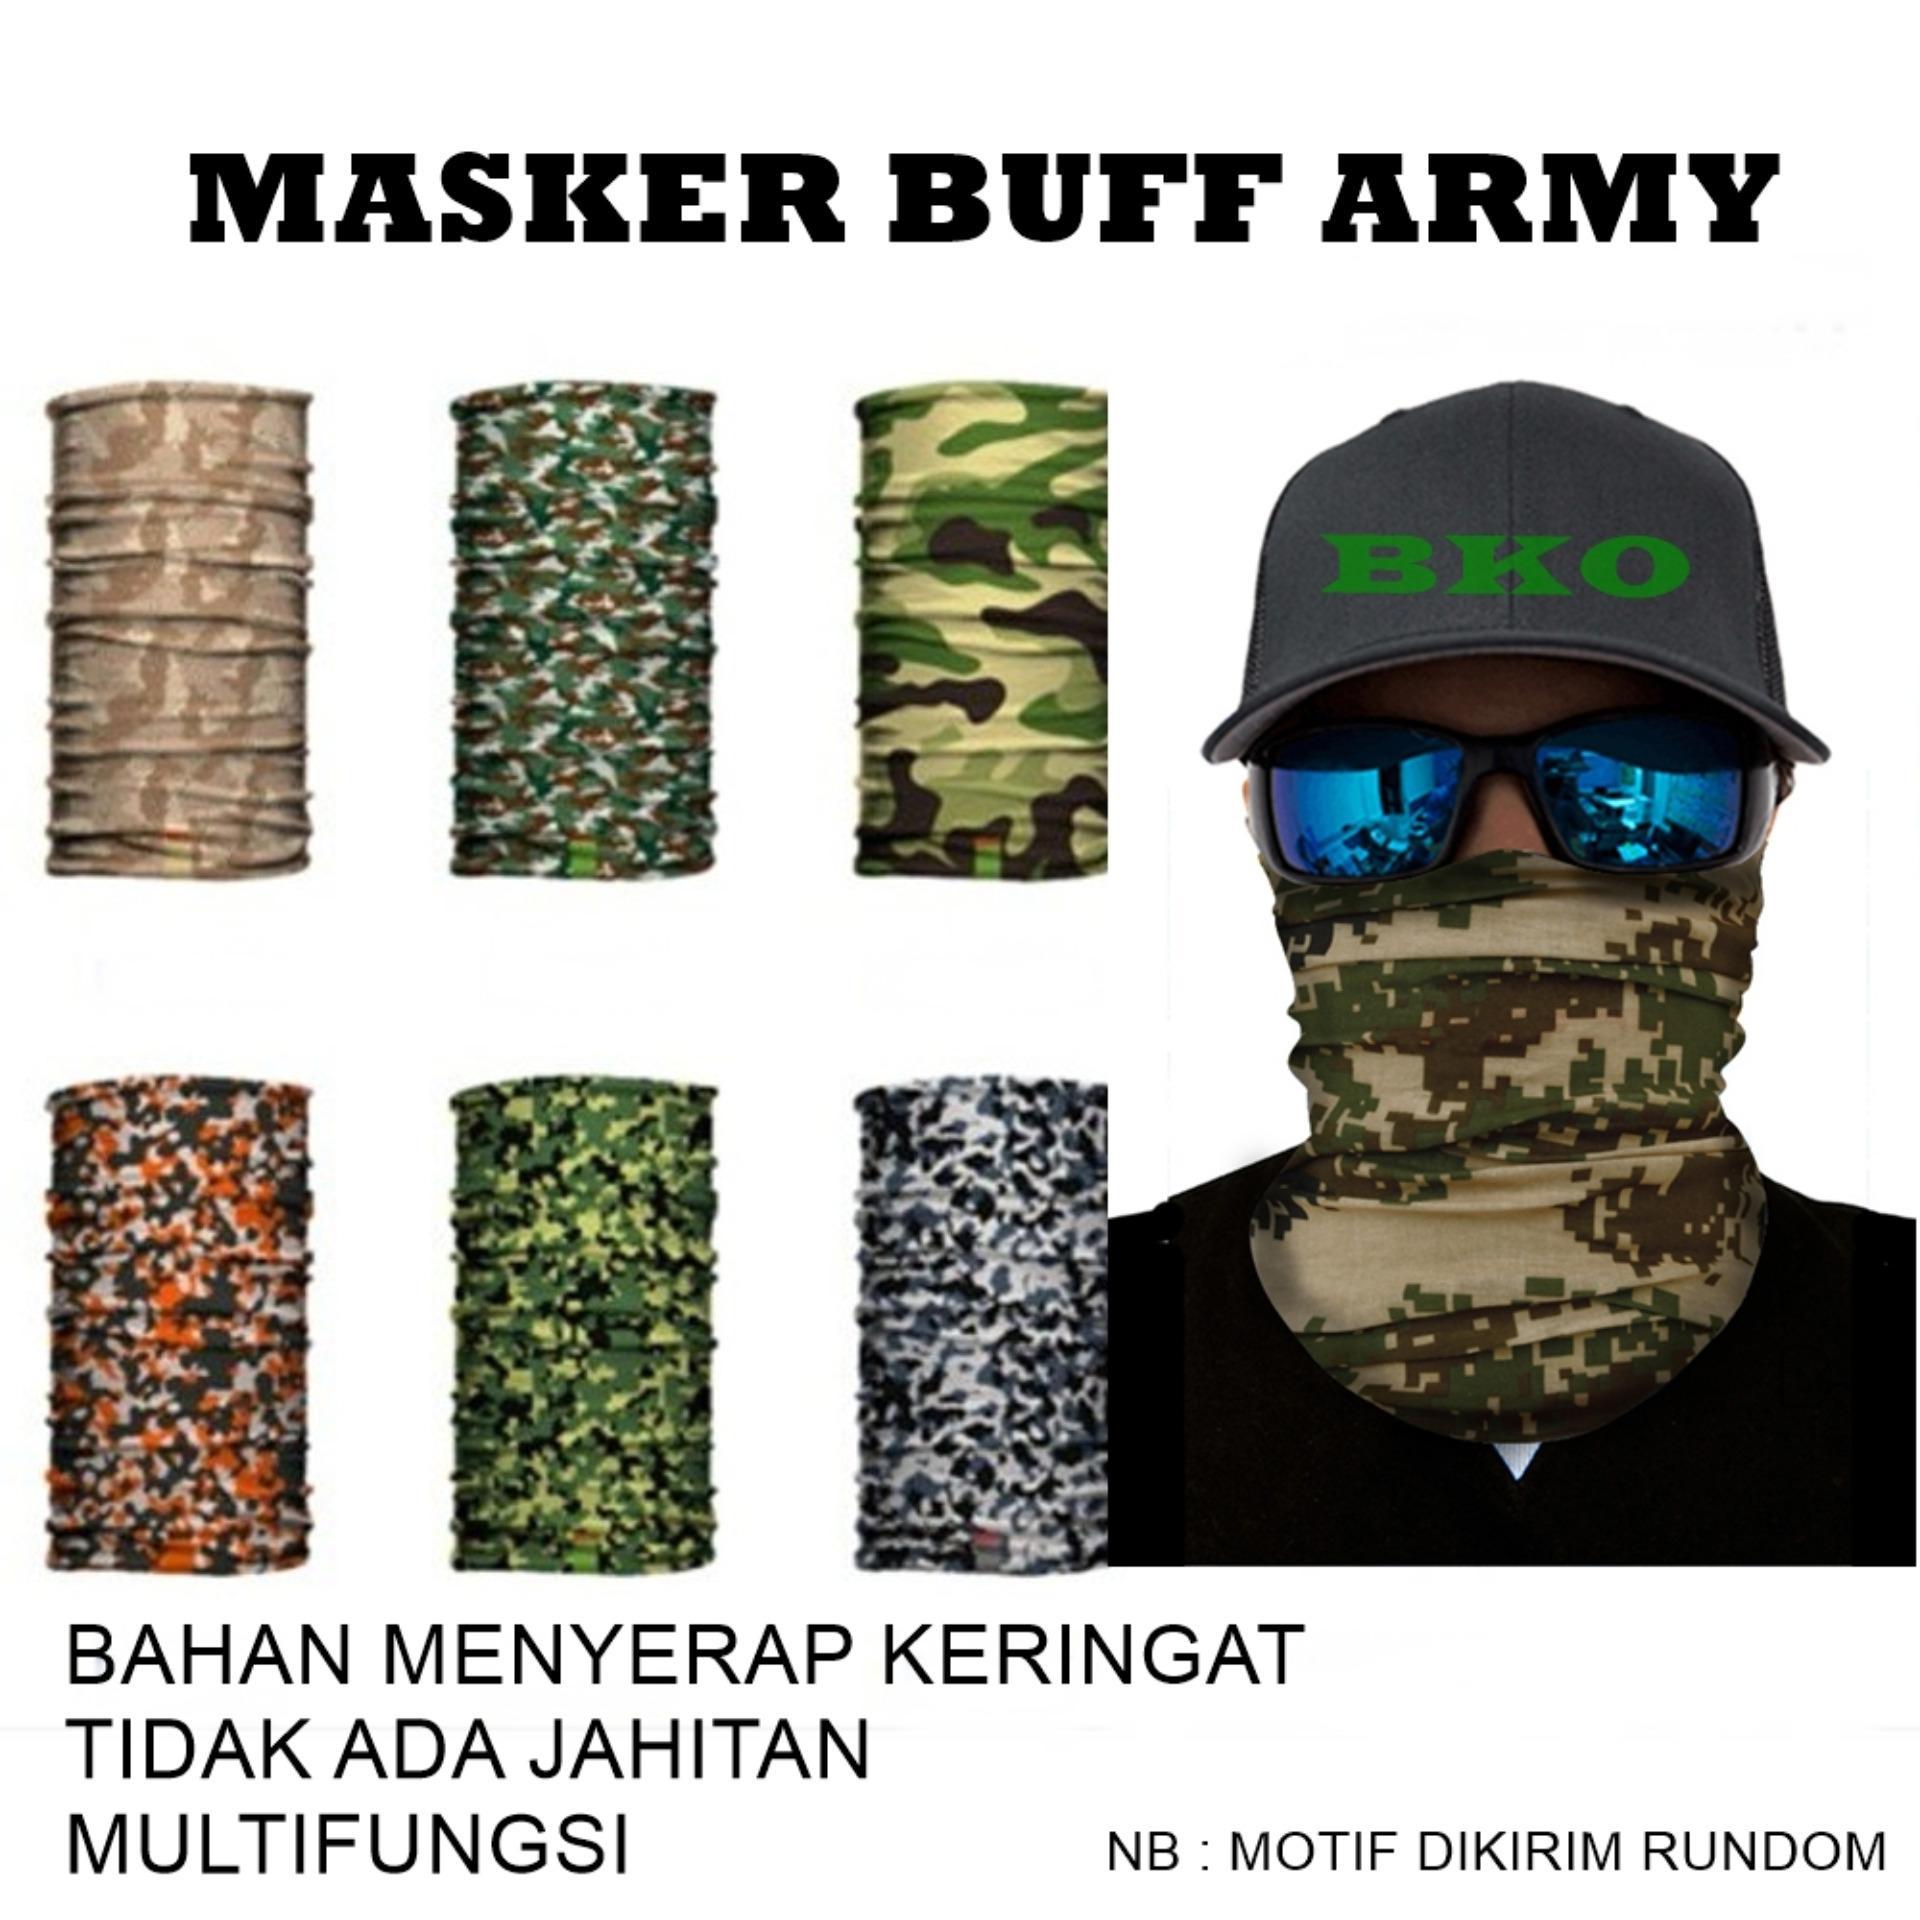 MASKER BUFF ARMY LORENG HARGA GROSIR (MOTIF ACAK)